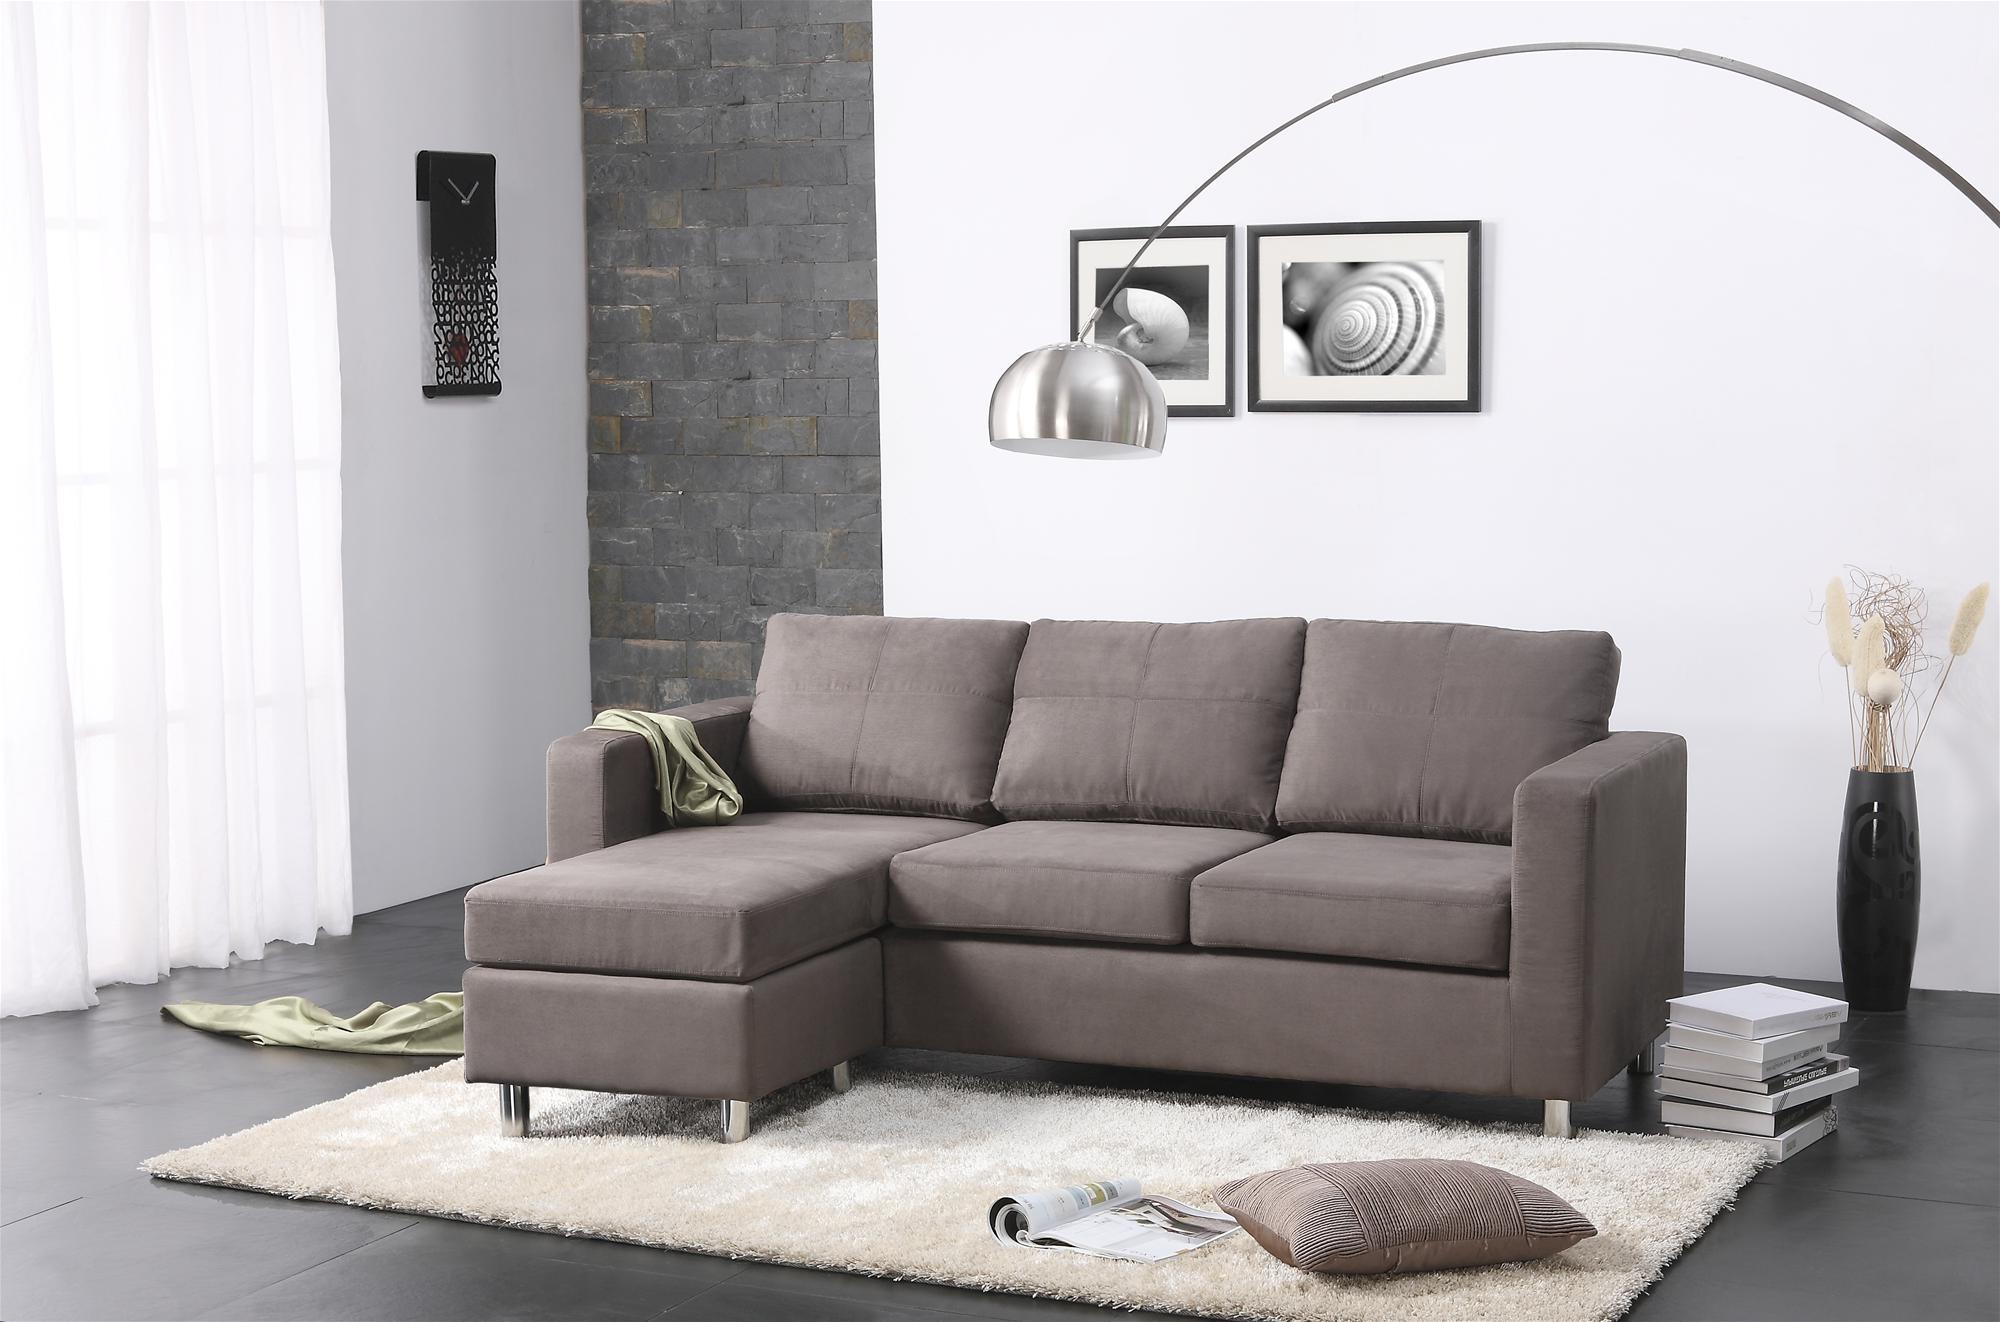 Narrow Spaces Sectional Sofas With Regard To Latest Sofa : Small Sofas For Small Spaces Tiny Sleeper Sofa Retro Sofa (View 8 of 20)